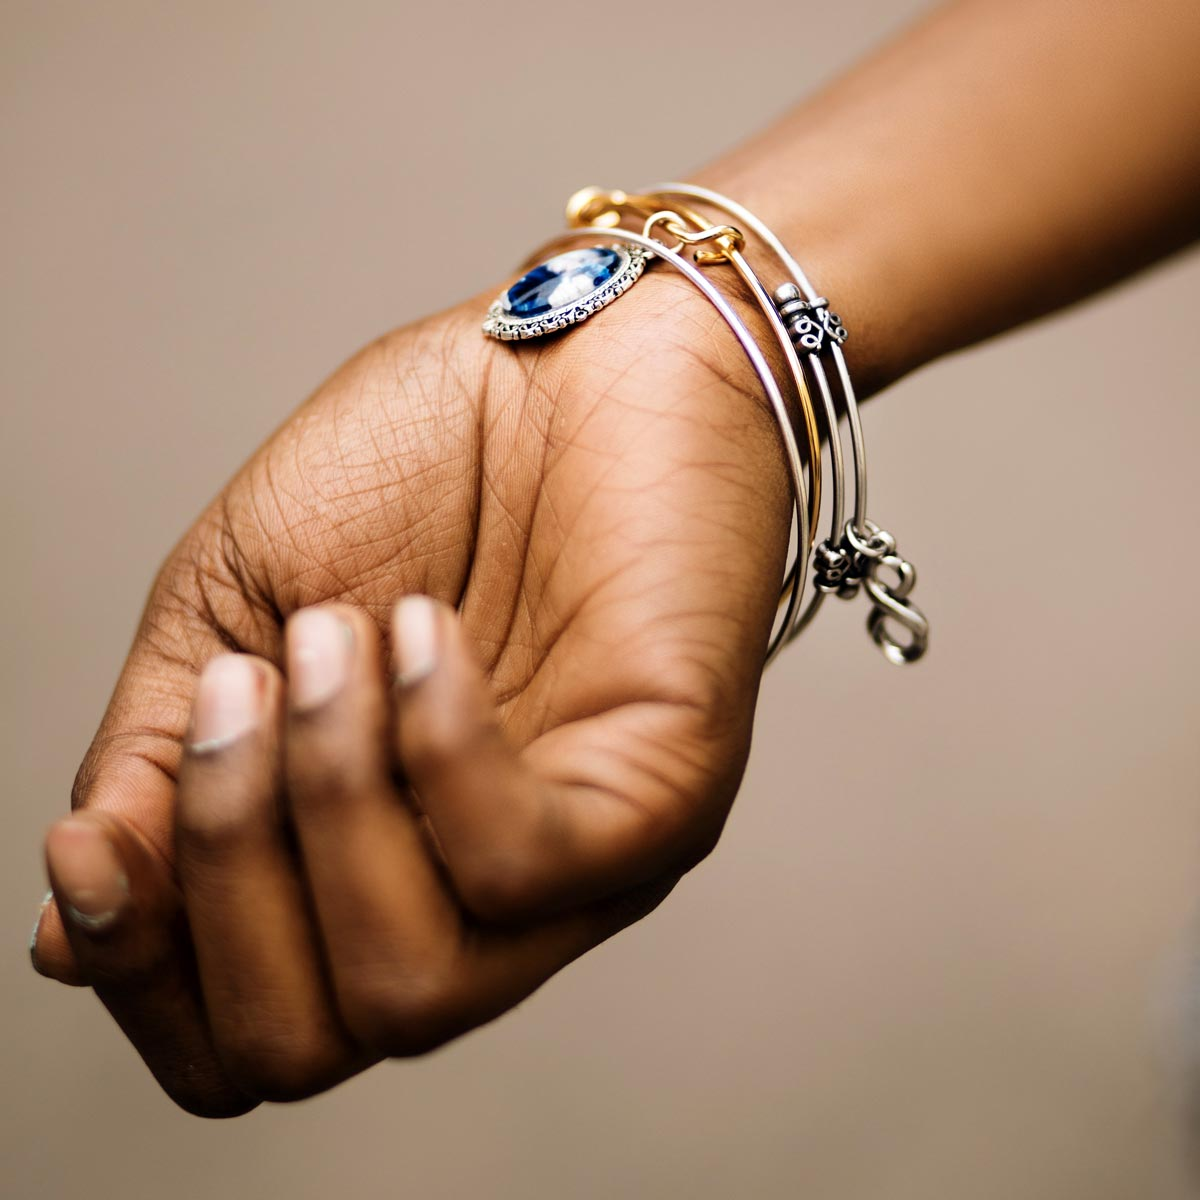 Bracelets Grand Rapids Jewelry Store